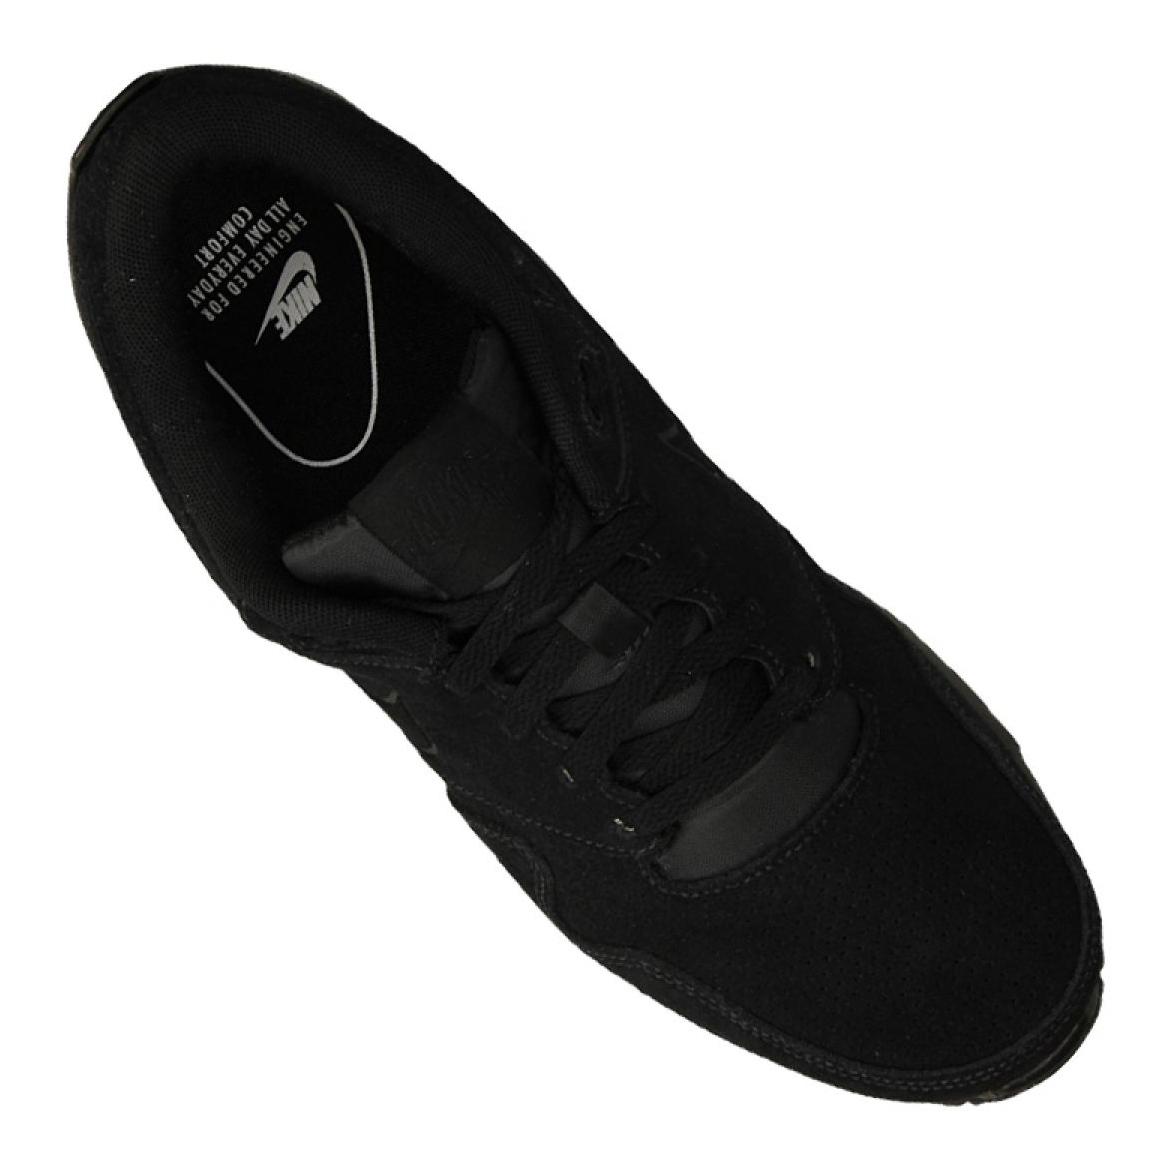 Nike Air Max Odyssey M 652989 001 cipő fekete ButyModne.pl